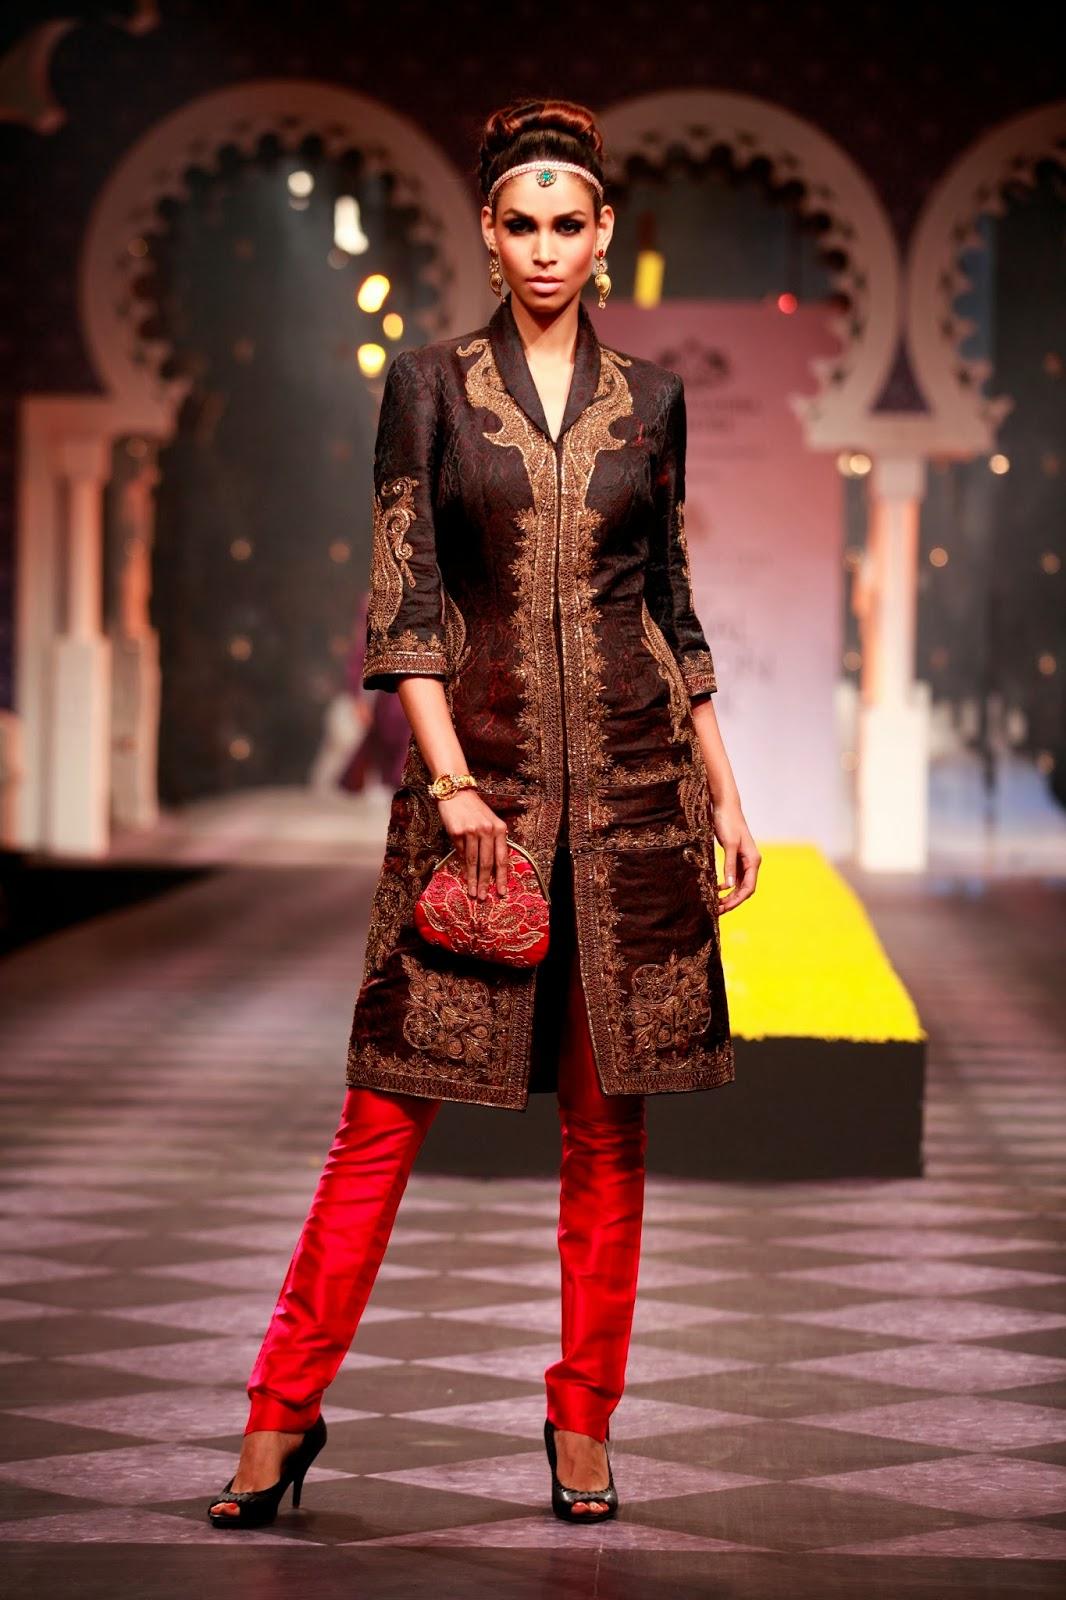 Ethnic Indian Saree For Bride: Indian Ethnic Designer Fashion Men Women By RAGHAVENDRA